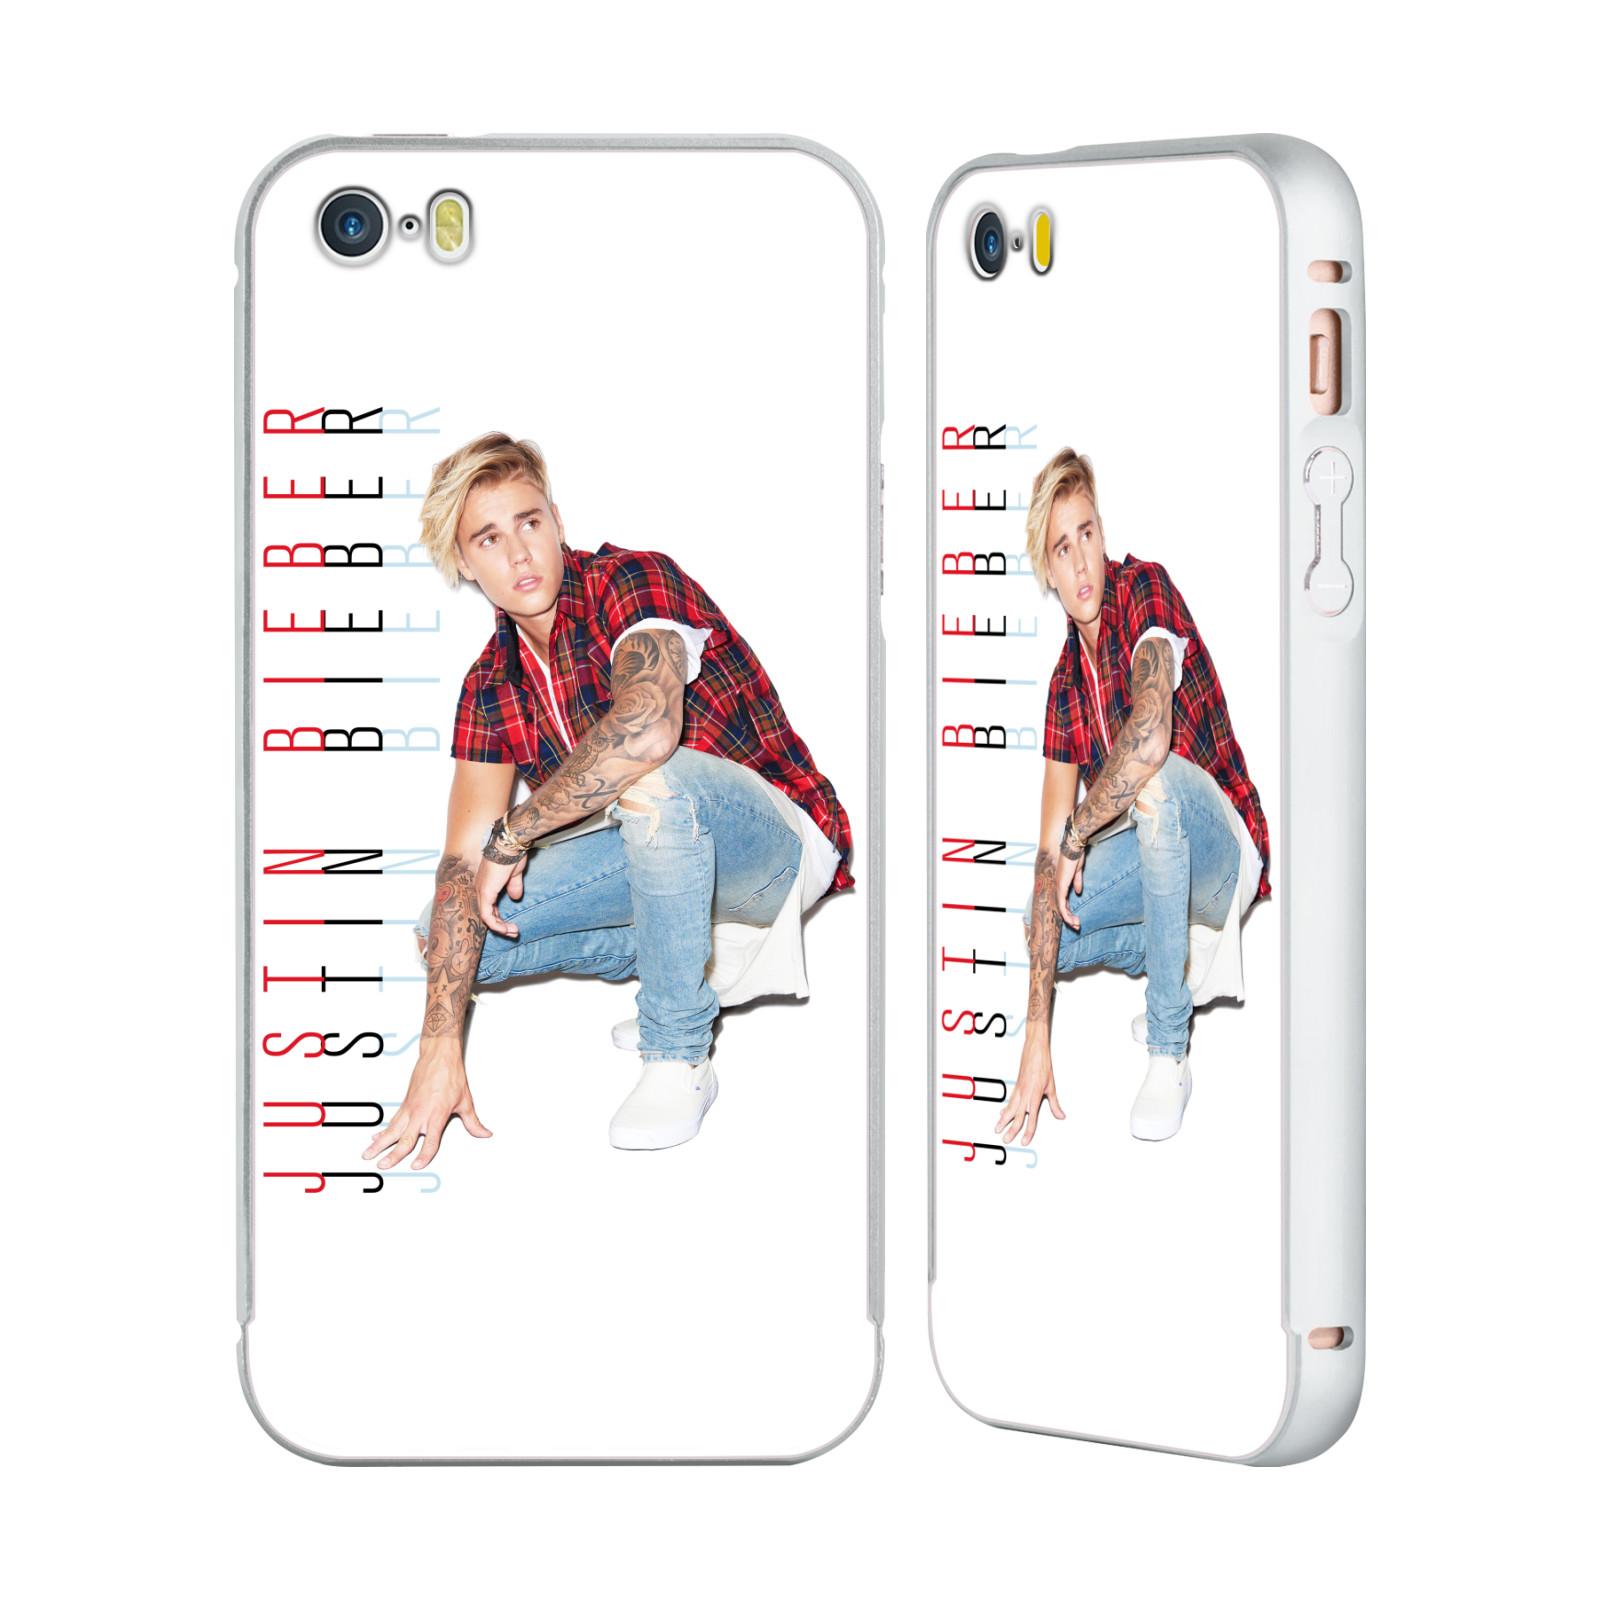 OFFICIAL-JUSTIN-BIEBER-KEY-ART-SILVER-BUMPER-SLIDER-CASE-FOR-APPLE-iPHONE-PHONES